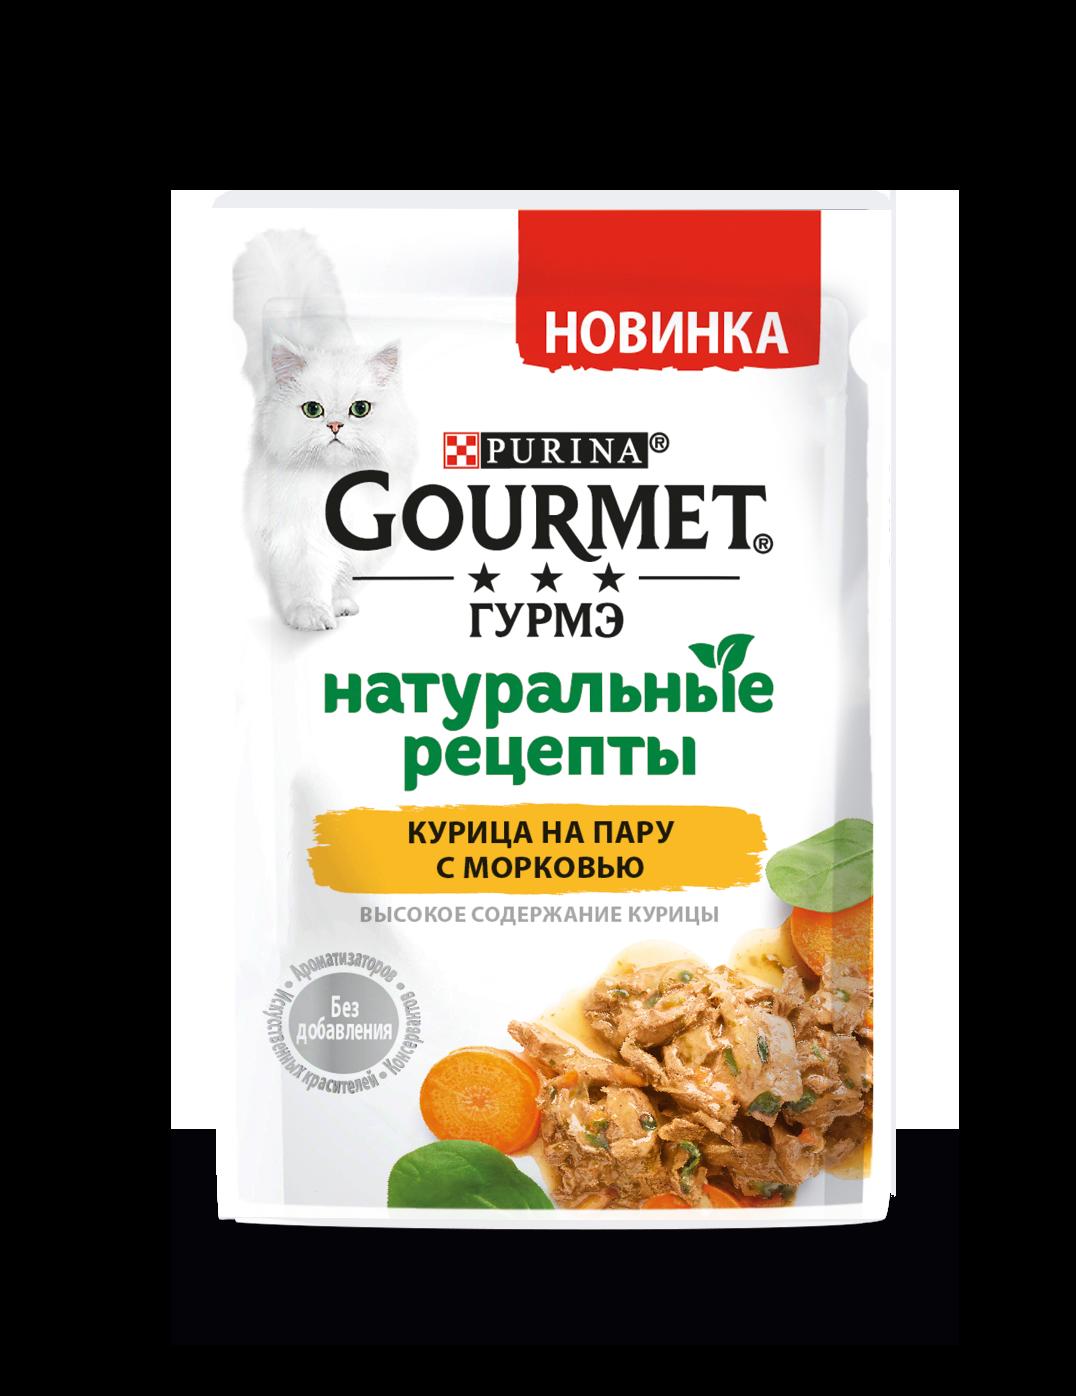 Влажный корм Gourmet Натуральные рецепты для кошек, курица на пару с морковью, 0.075кг